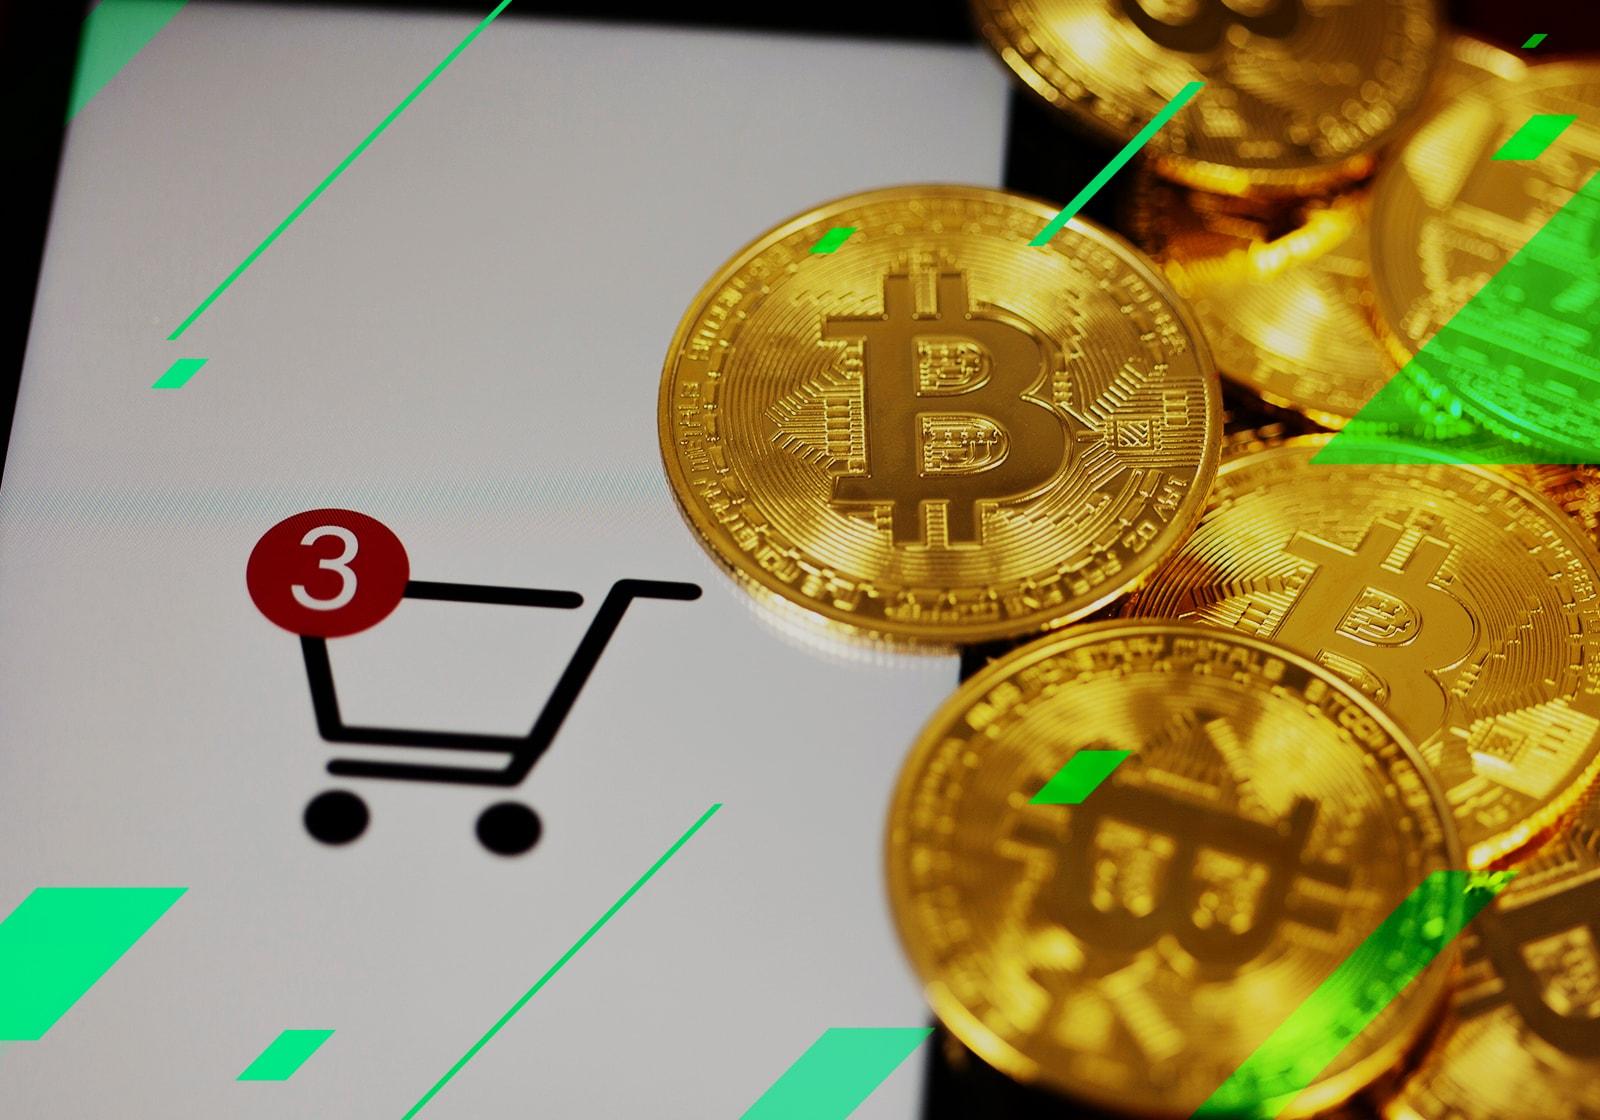 Buy with bitcoins i have 1000 bitcoins mining